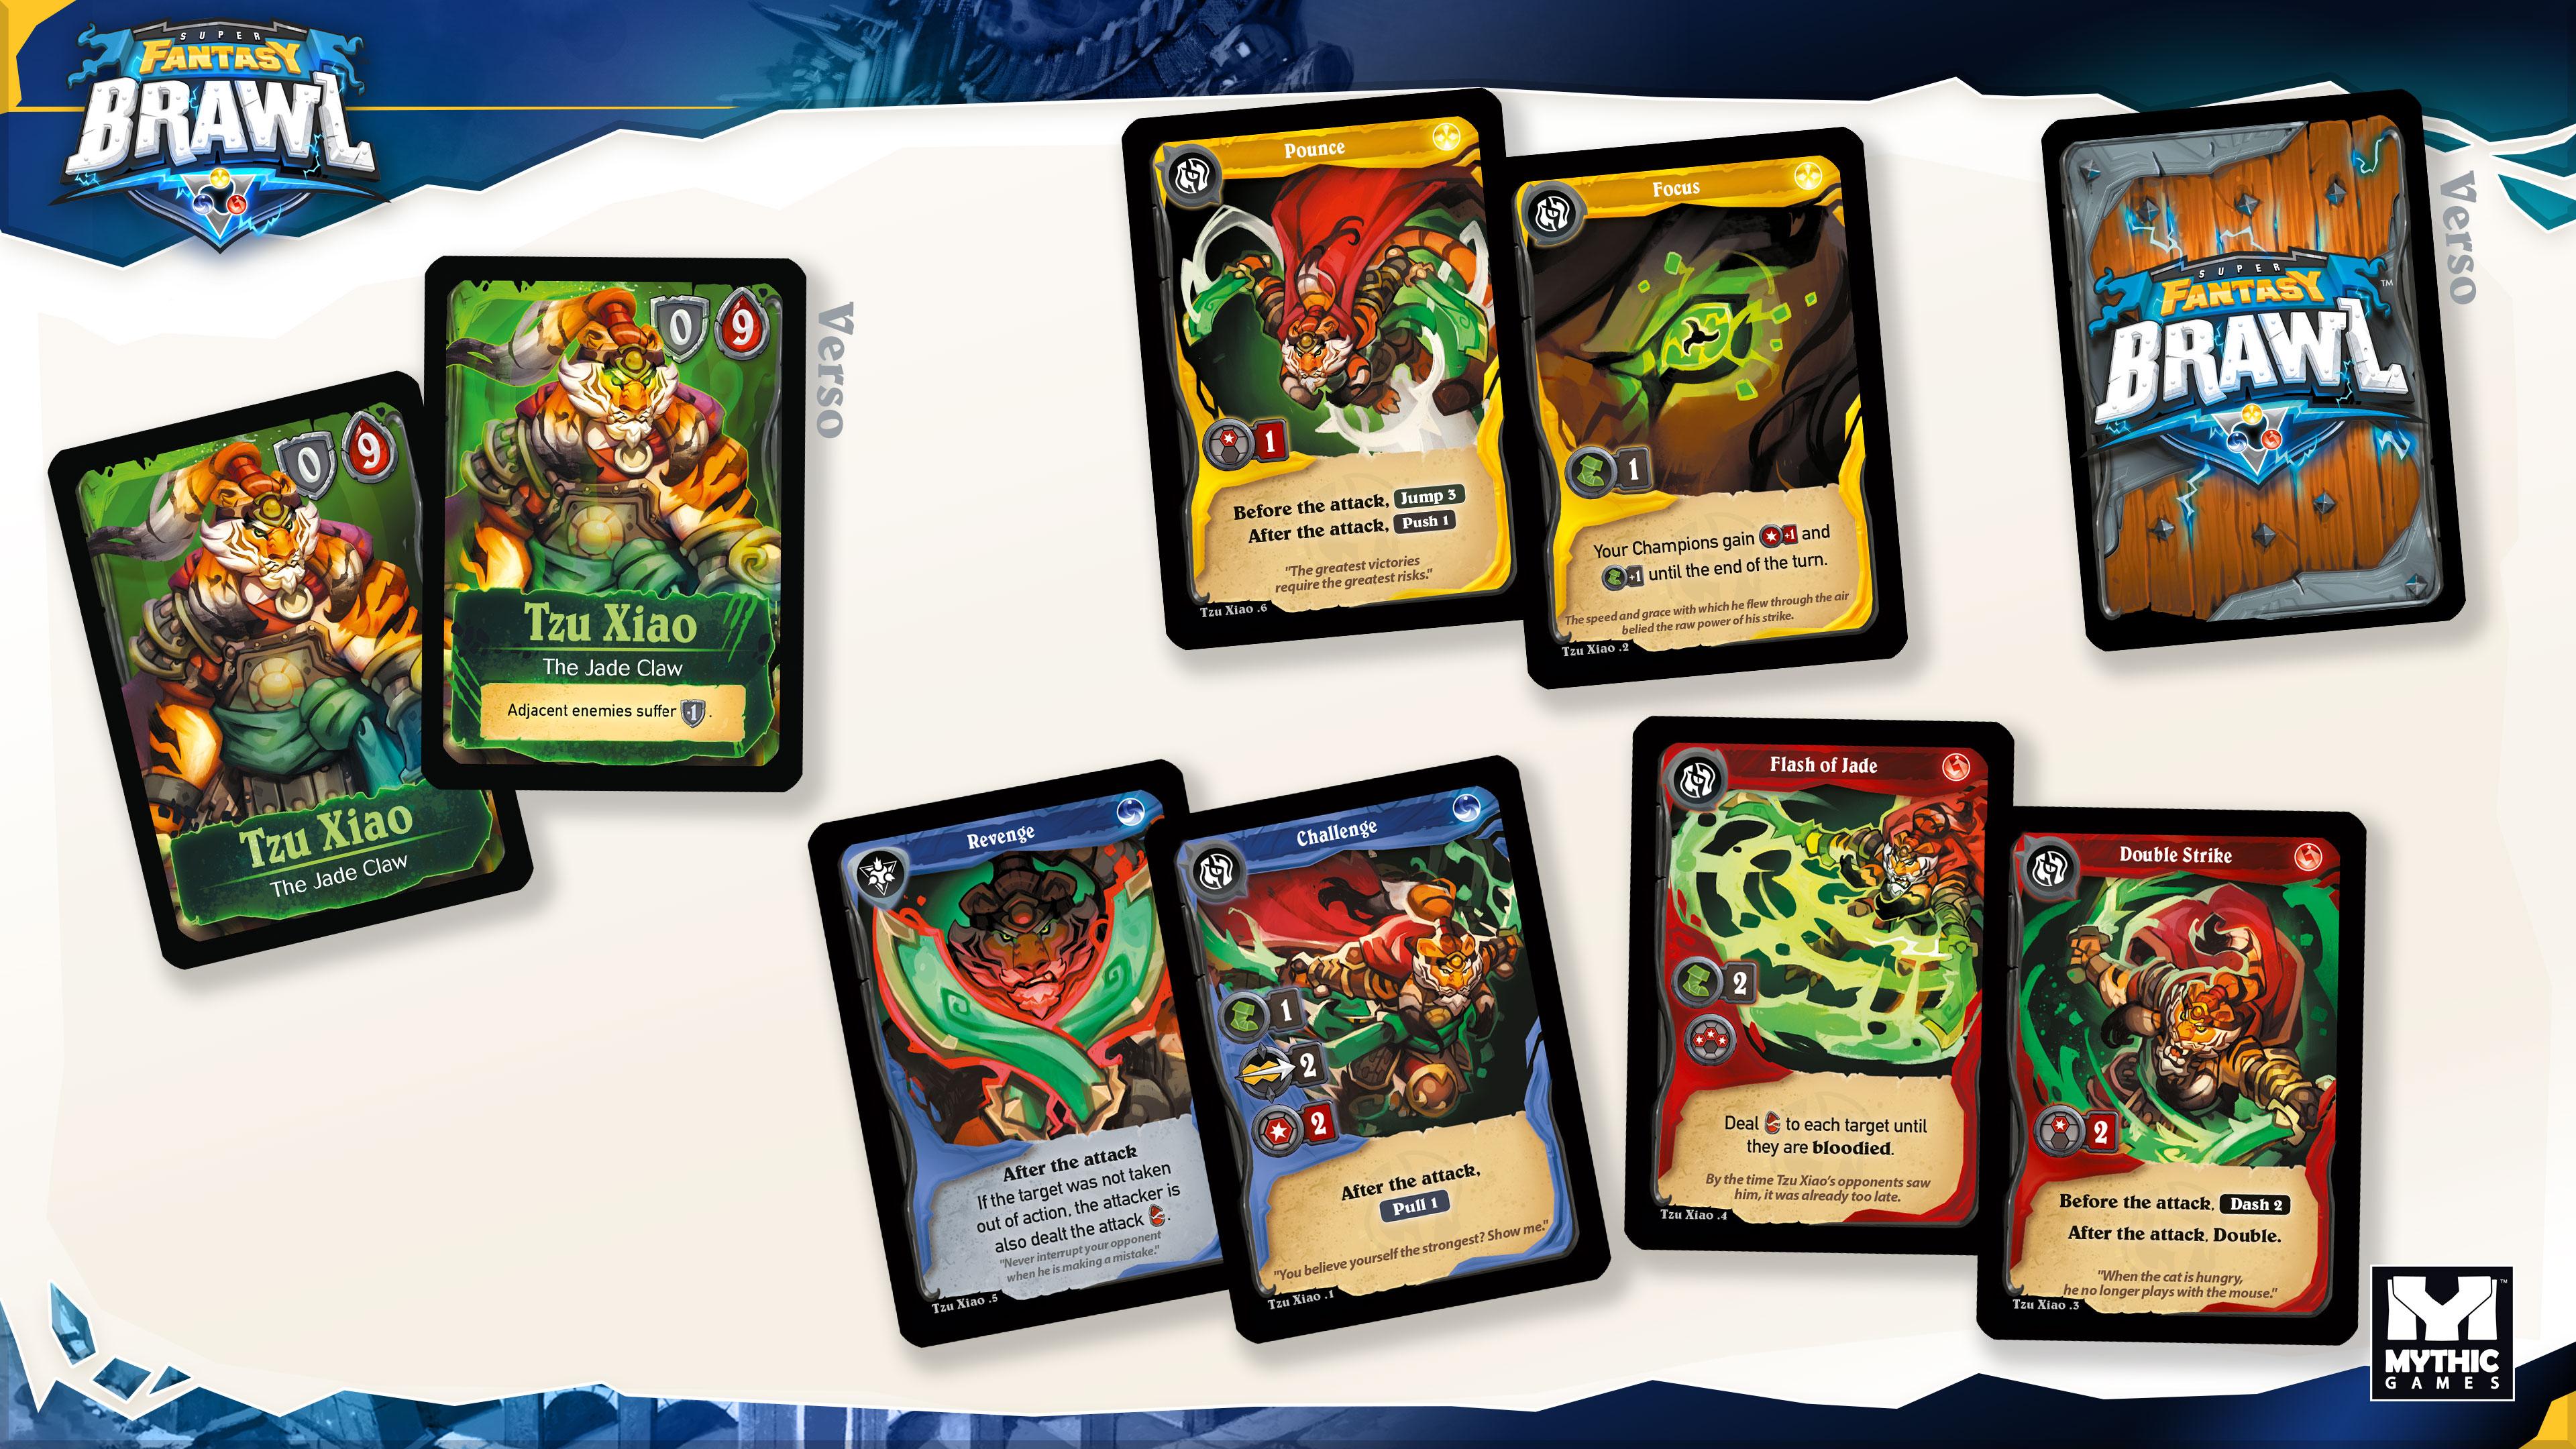 Super Fantasy Brawl cards